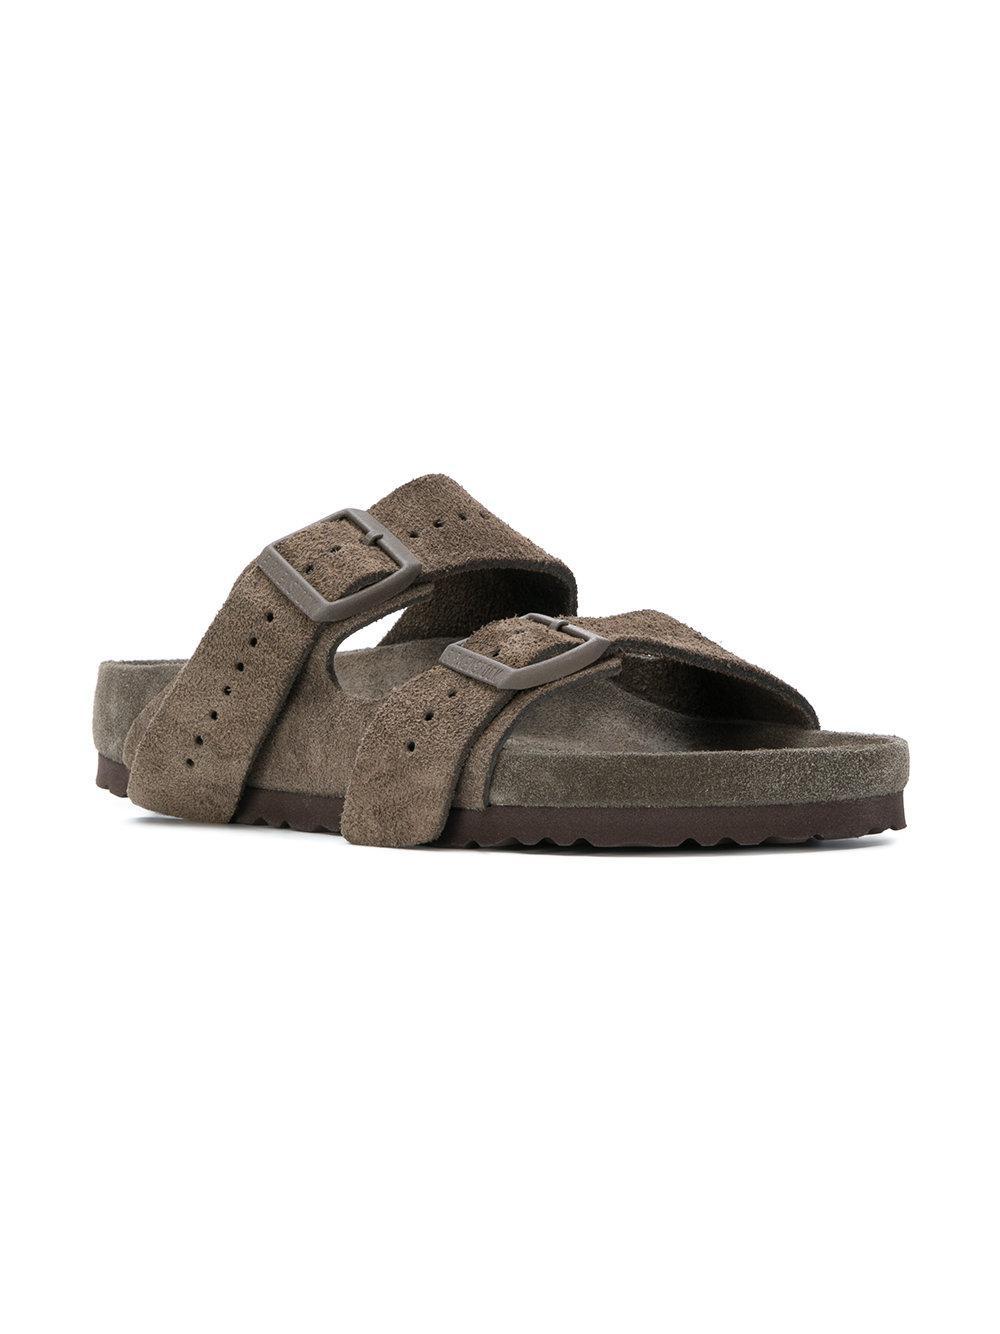 ae56a580e86d Rick Owens Birkenstock X Arizona Sandals in Brown - Lyst